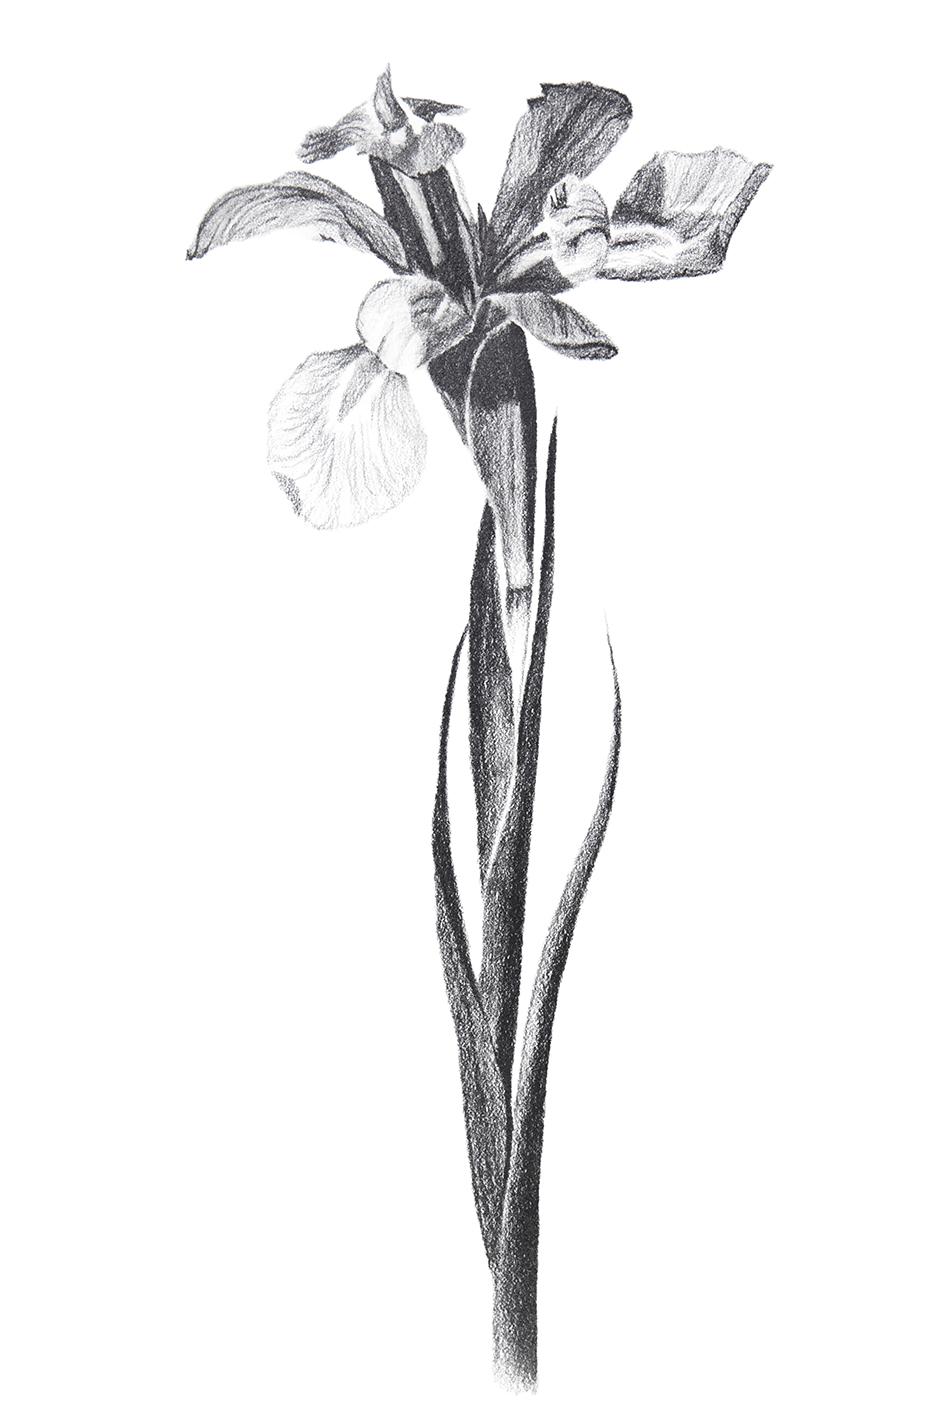 Flower Study 6 small.jpg